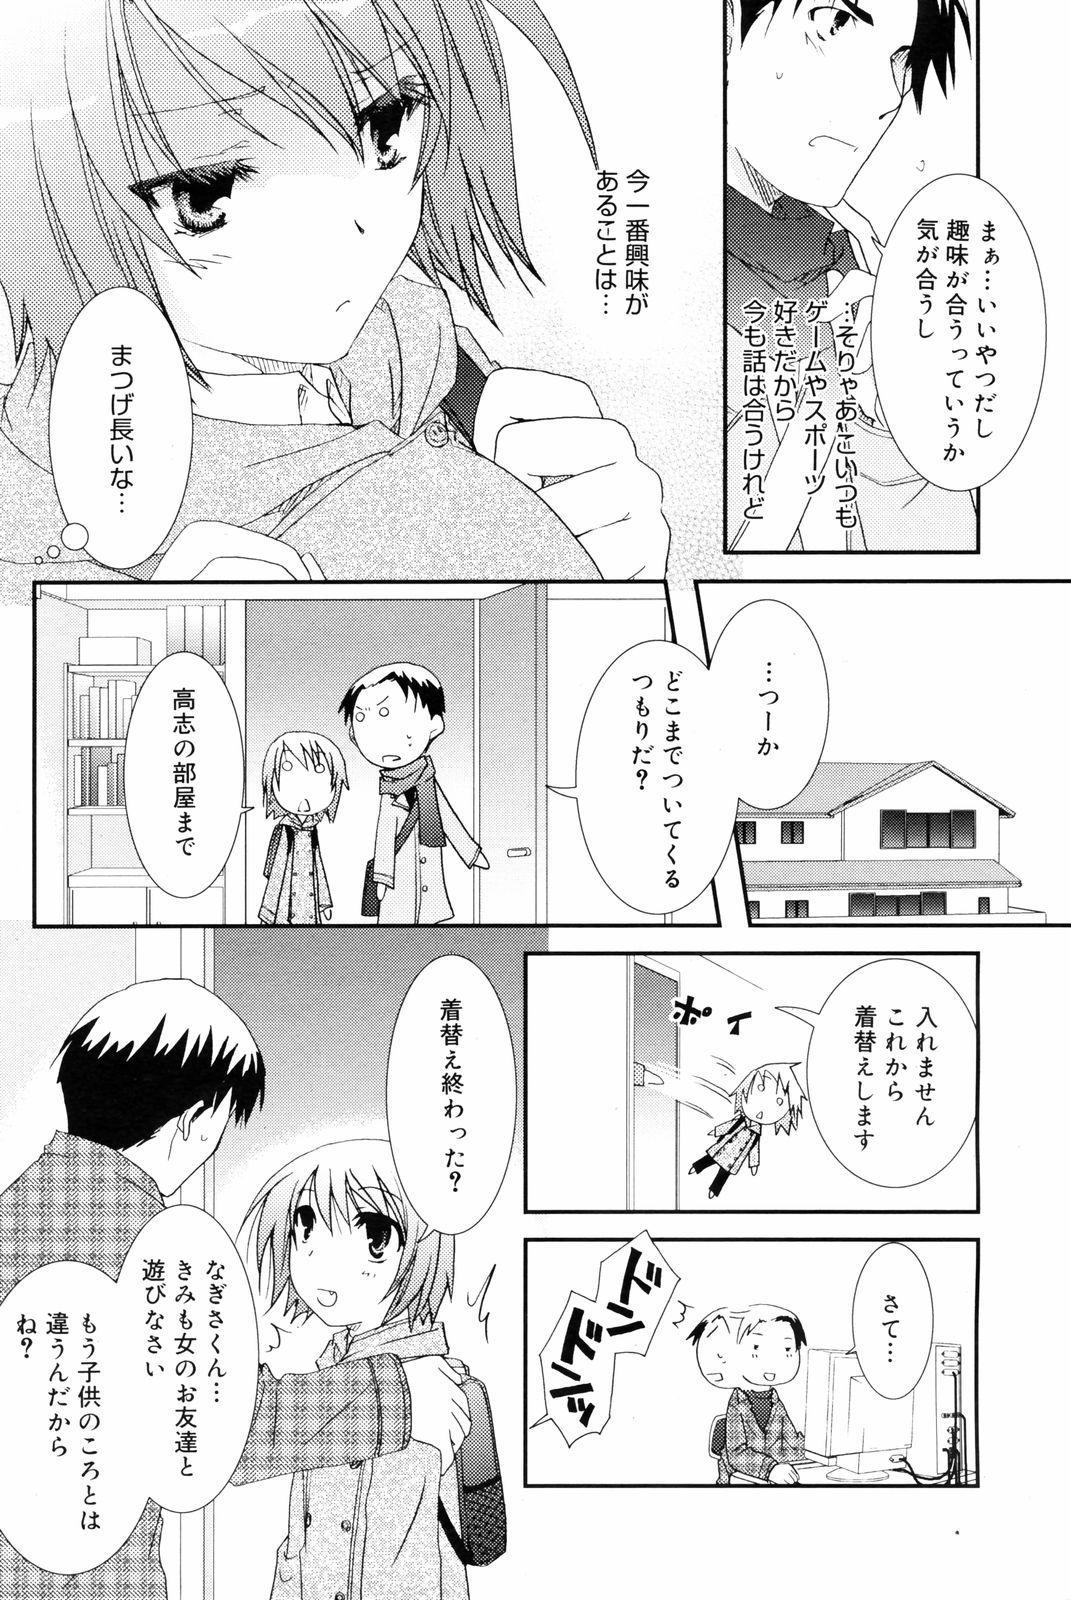 Manga Bangaichi 2008-03 179